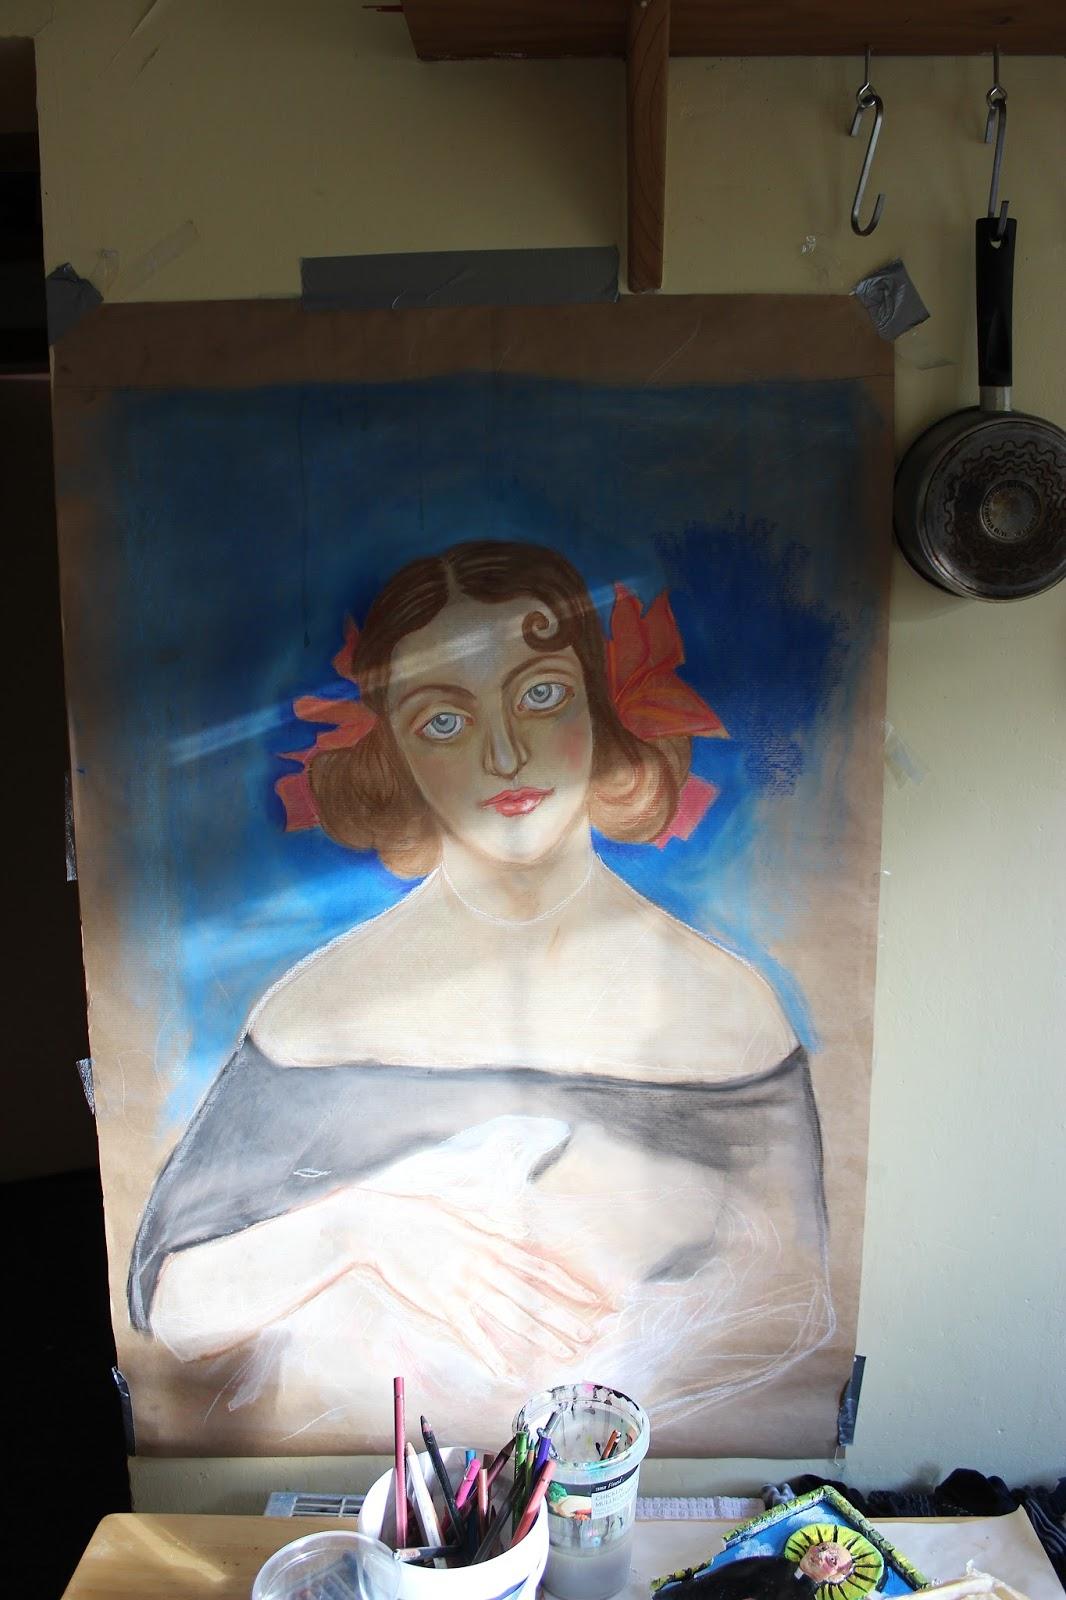 Pastel Brown Paper Sketch Woman Work in Progress